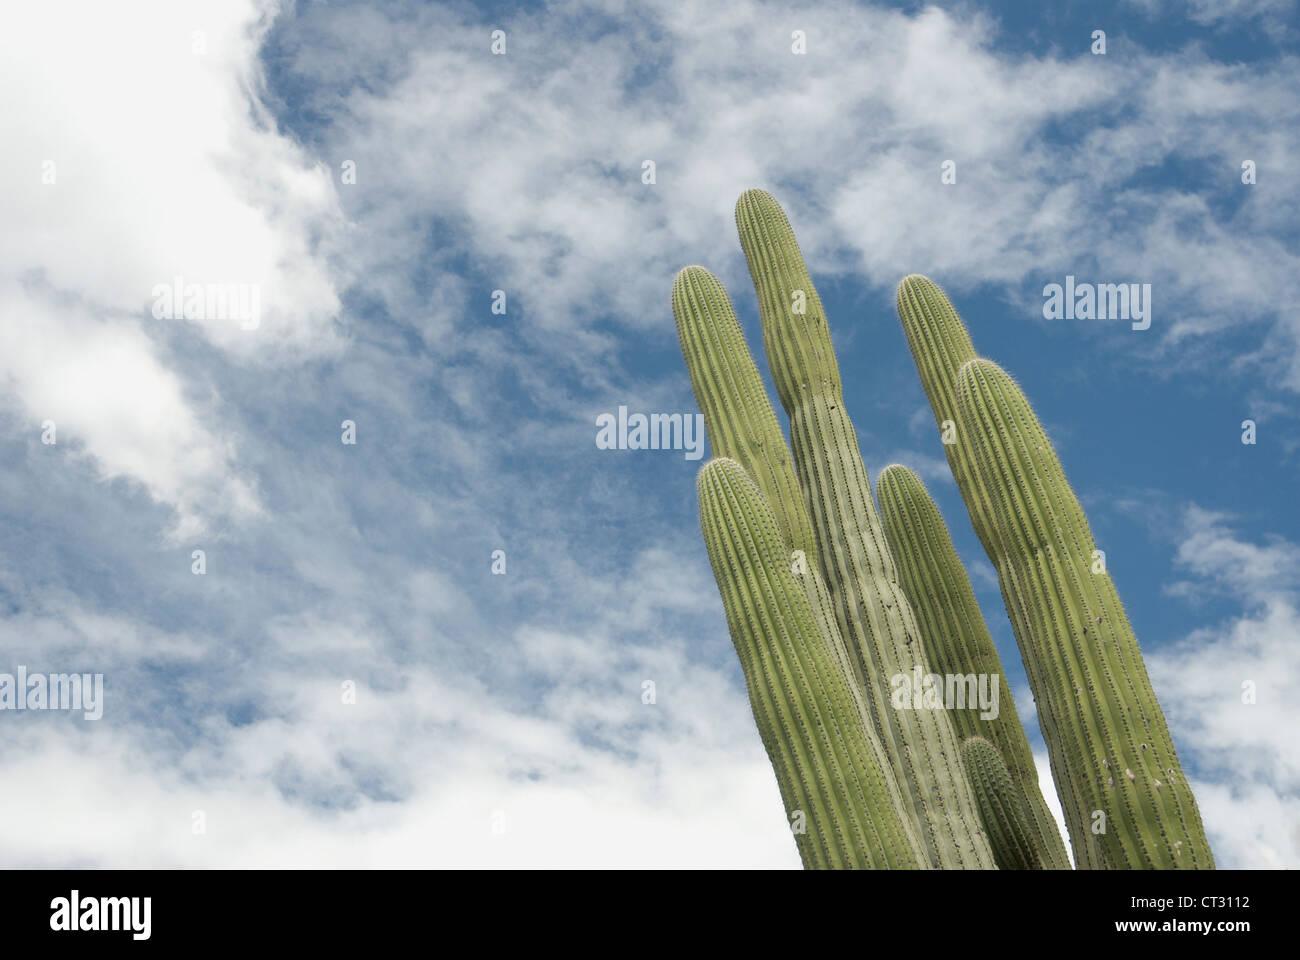 Saguaro cactus, Carnegiea gigantea, green spears of columnar succulent against a blue sky with clouds. - Stock Image